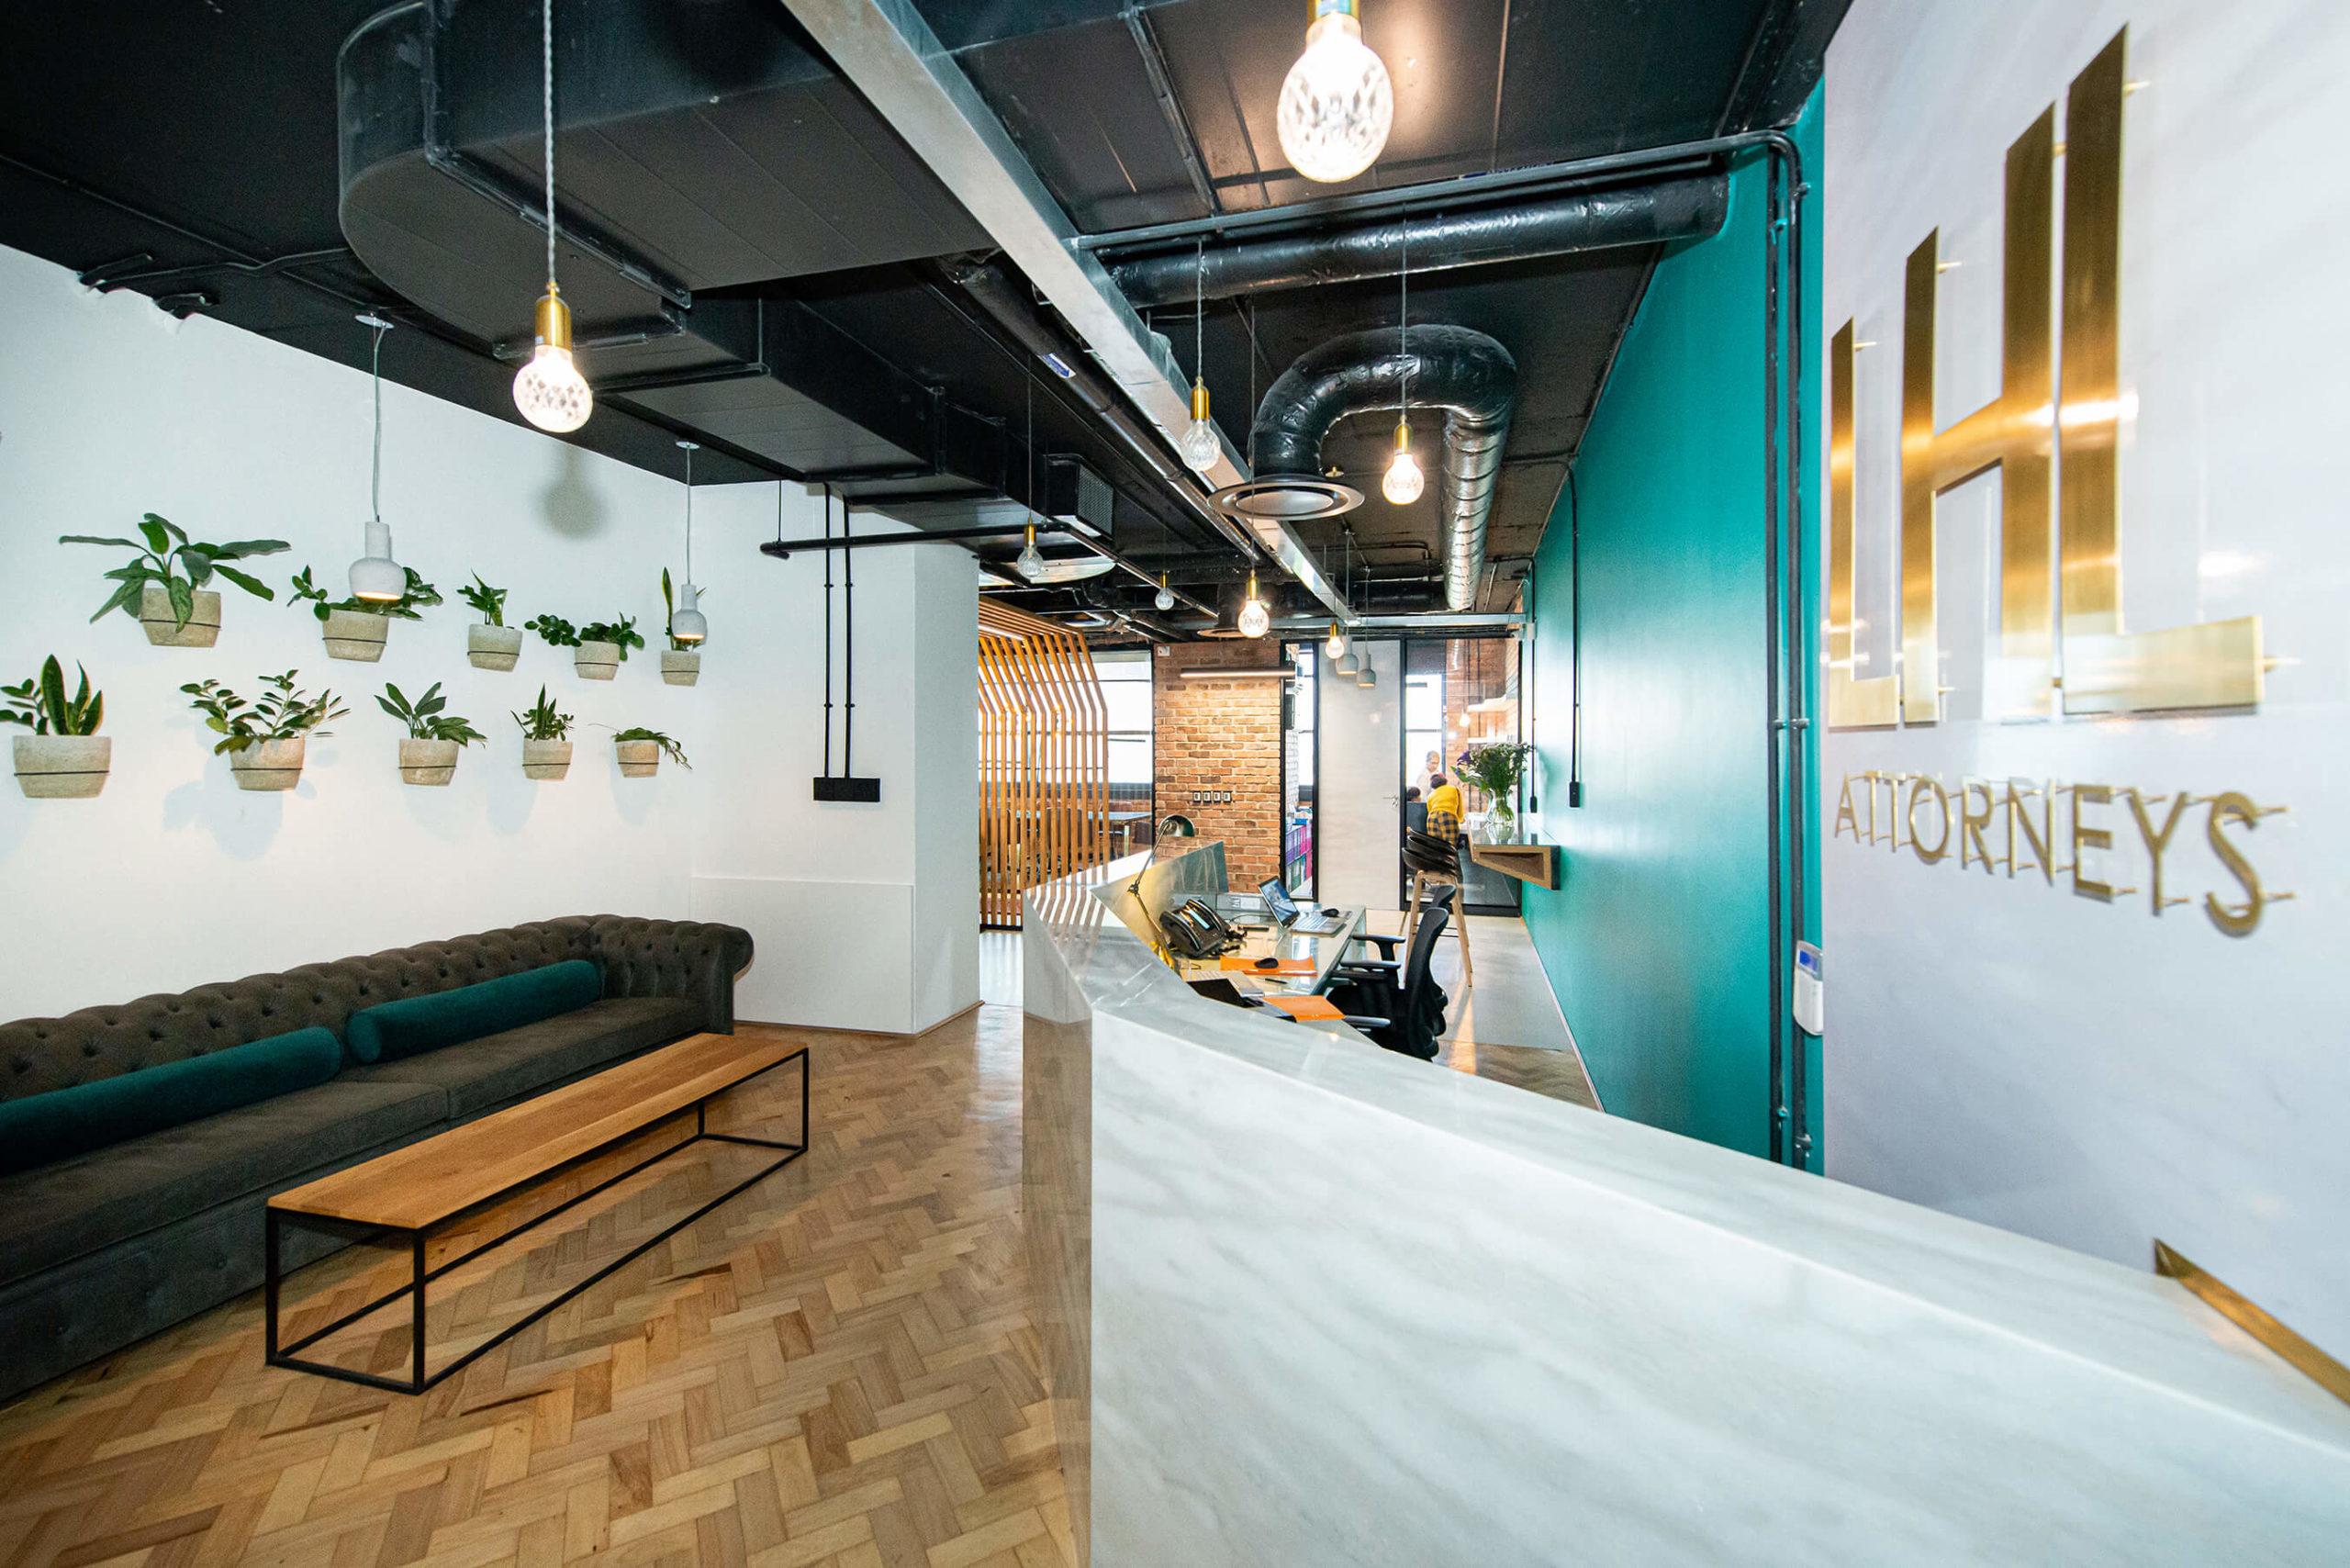 LHL Attorneys - Turnkey Interiors - Corporate Interior Design and Build